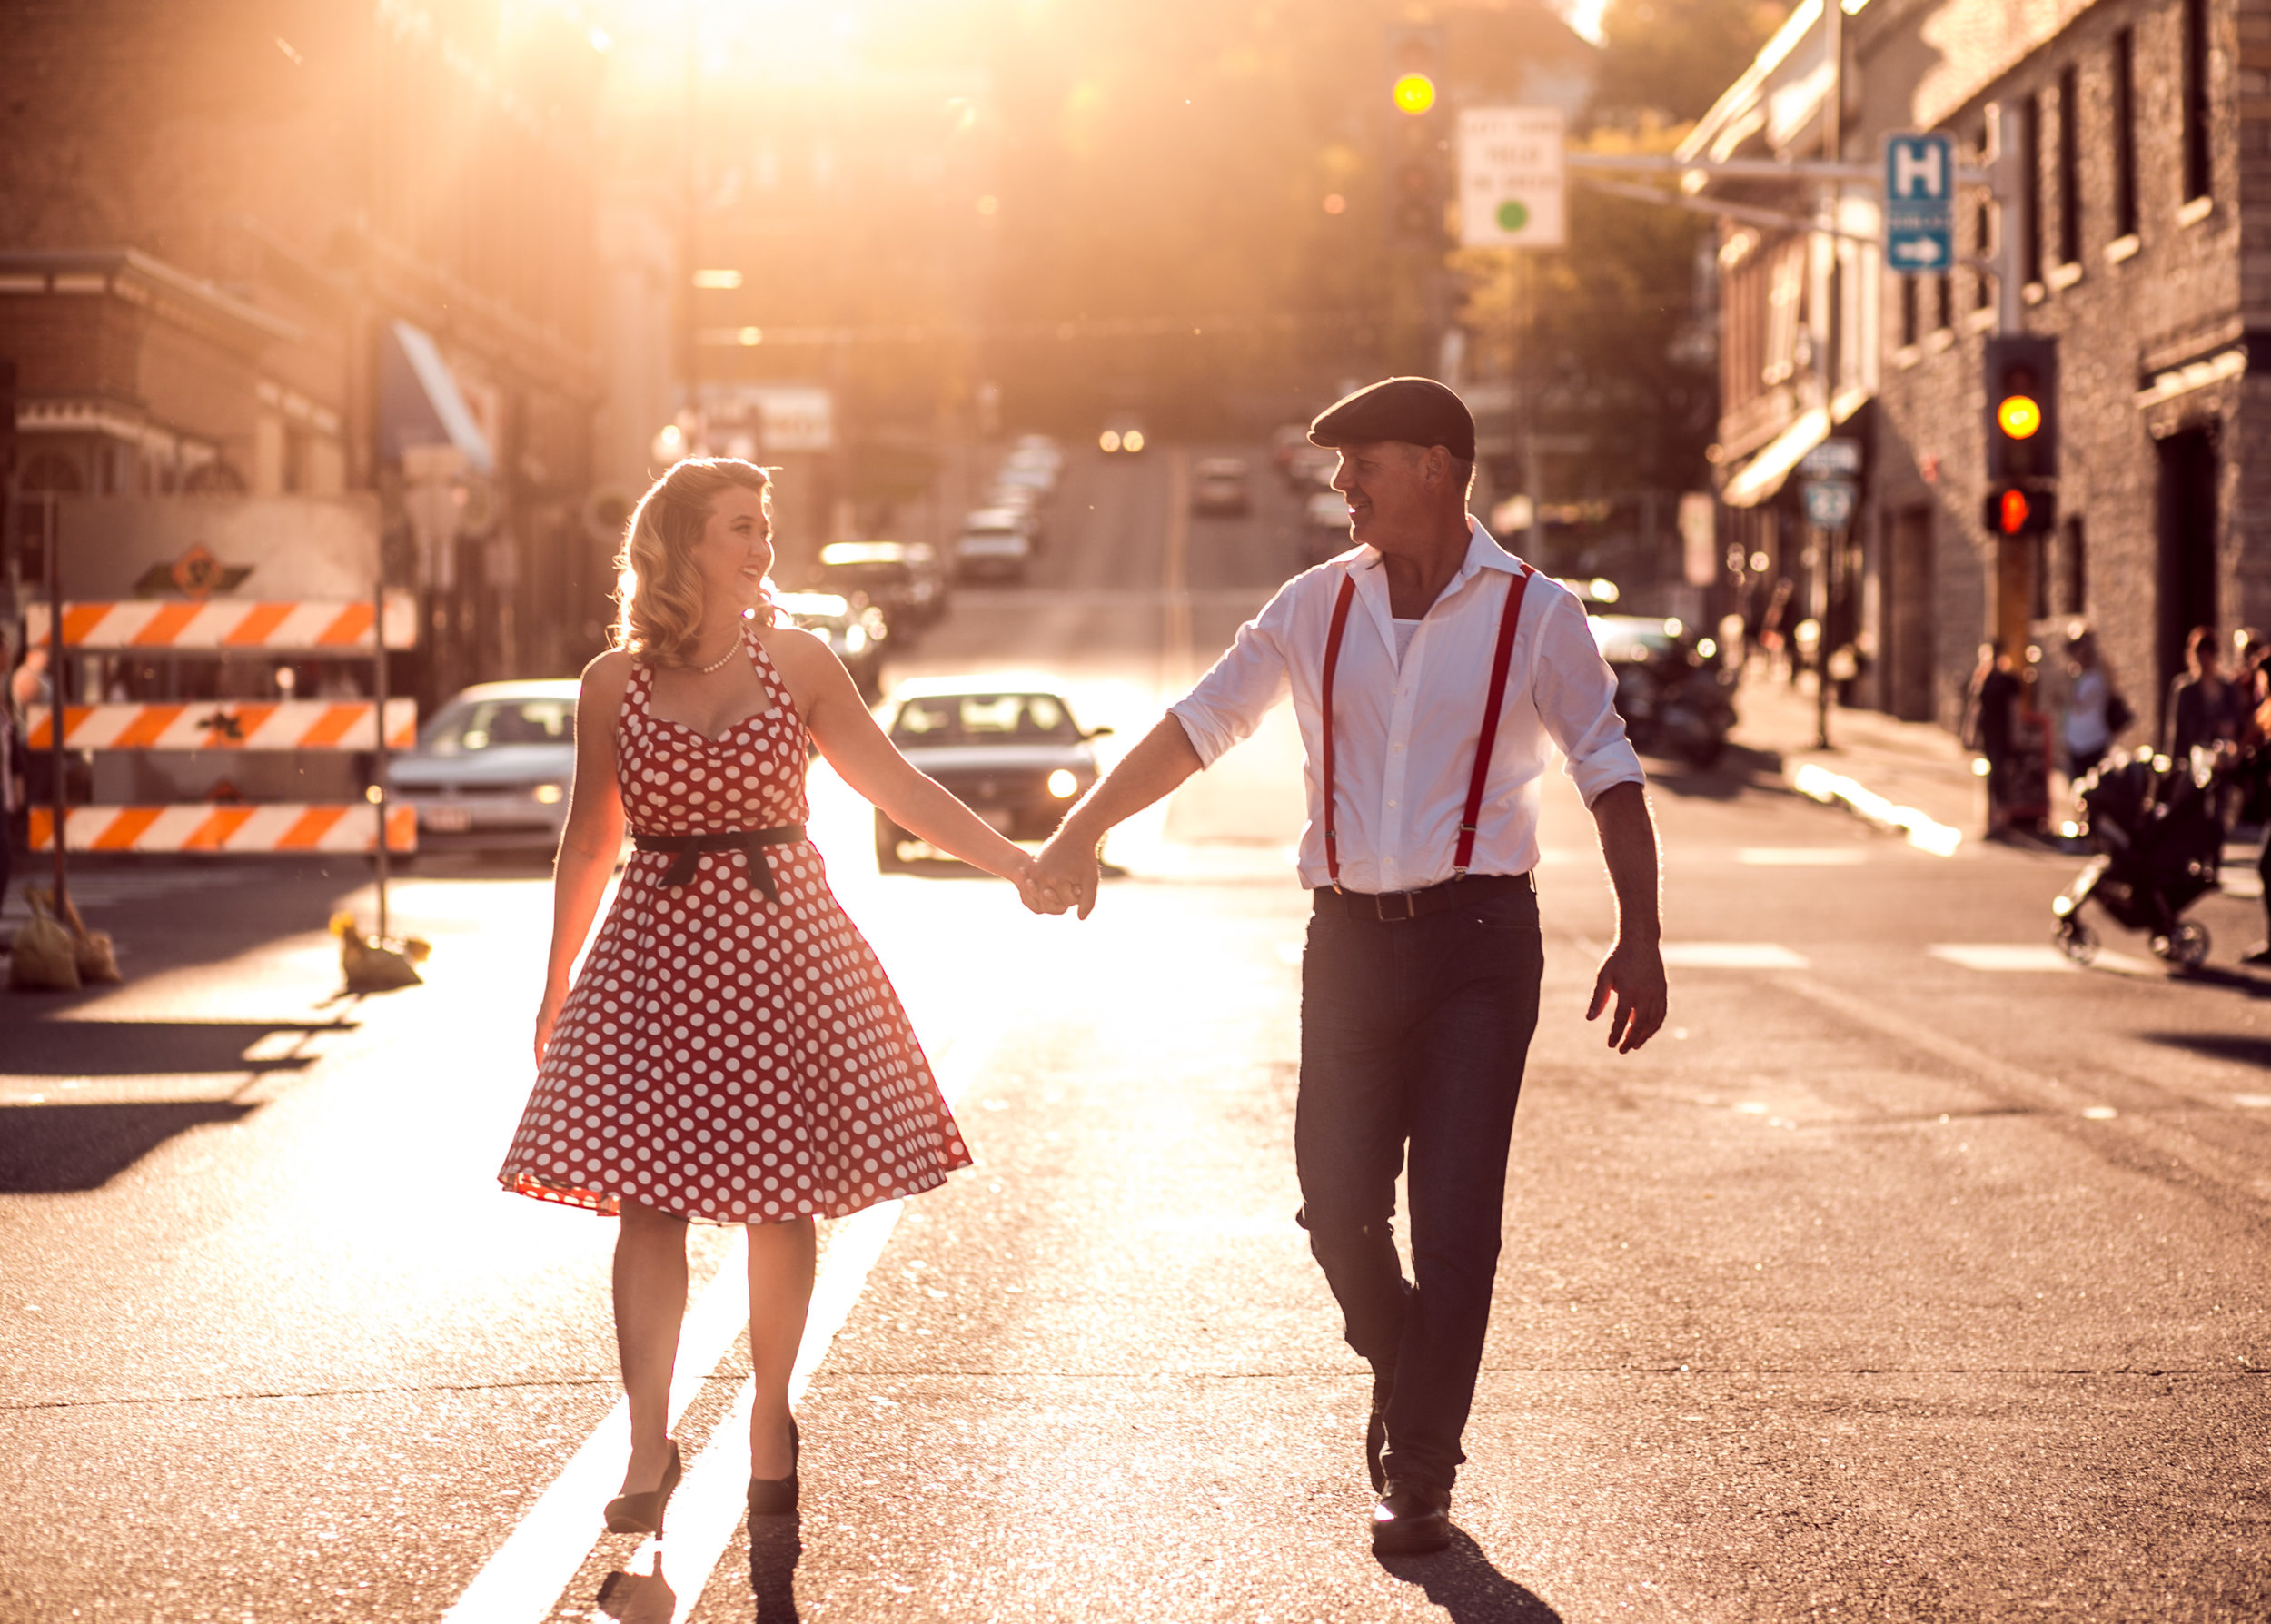 A couple dances in the golden light sunset in Stillwater MN street